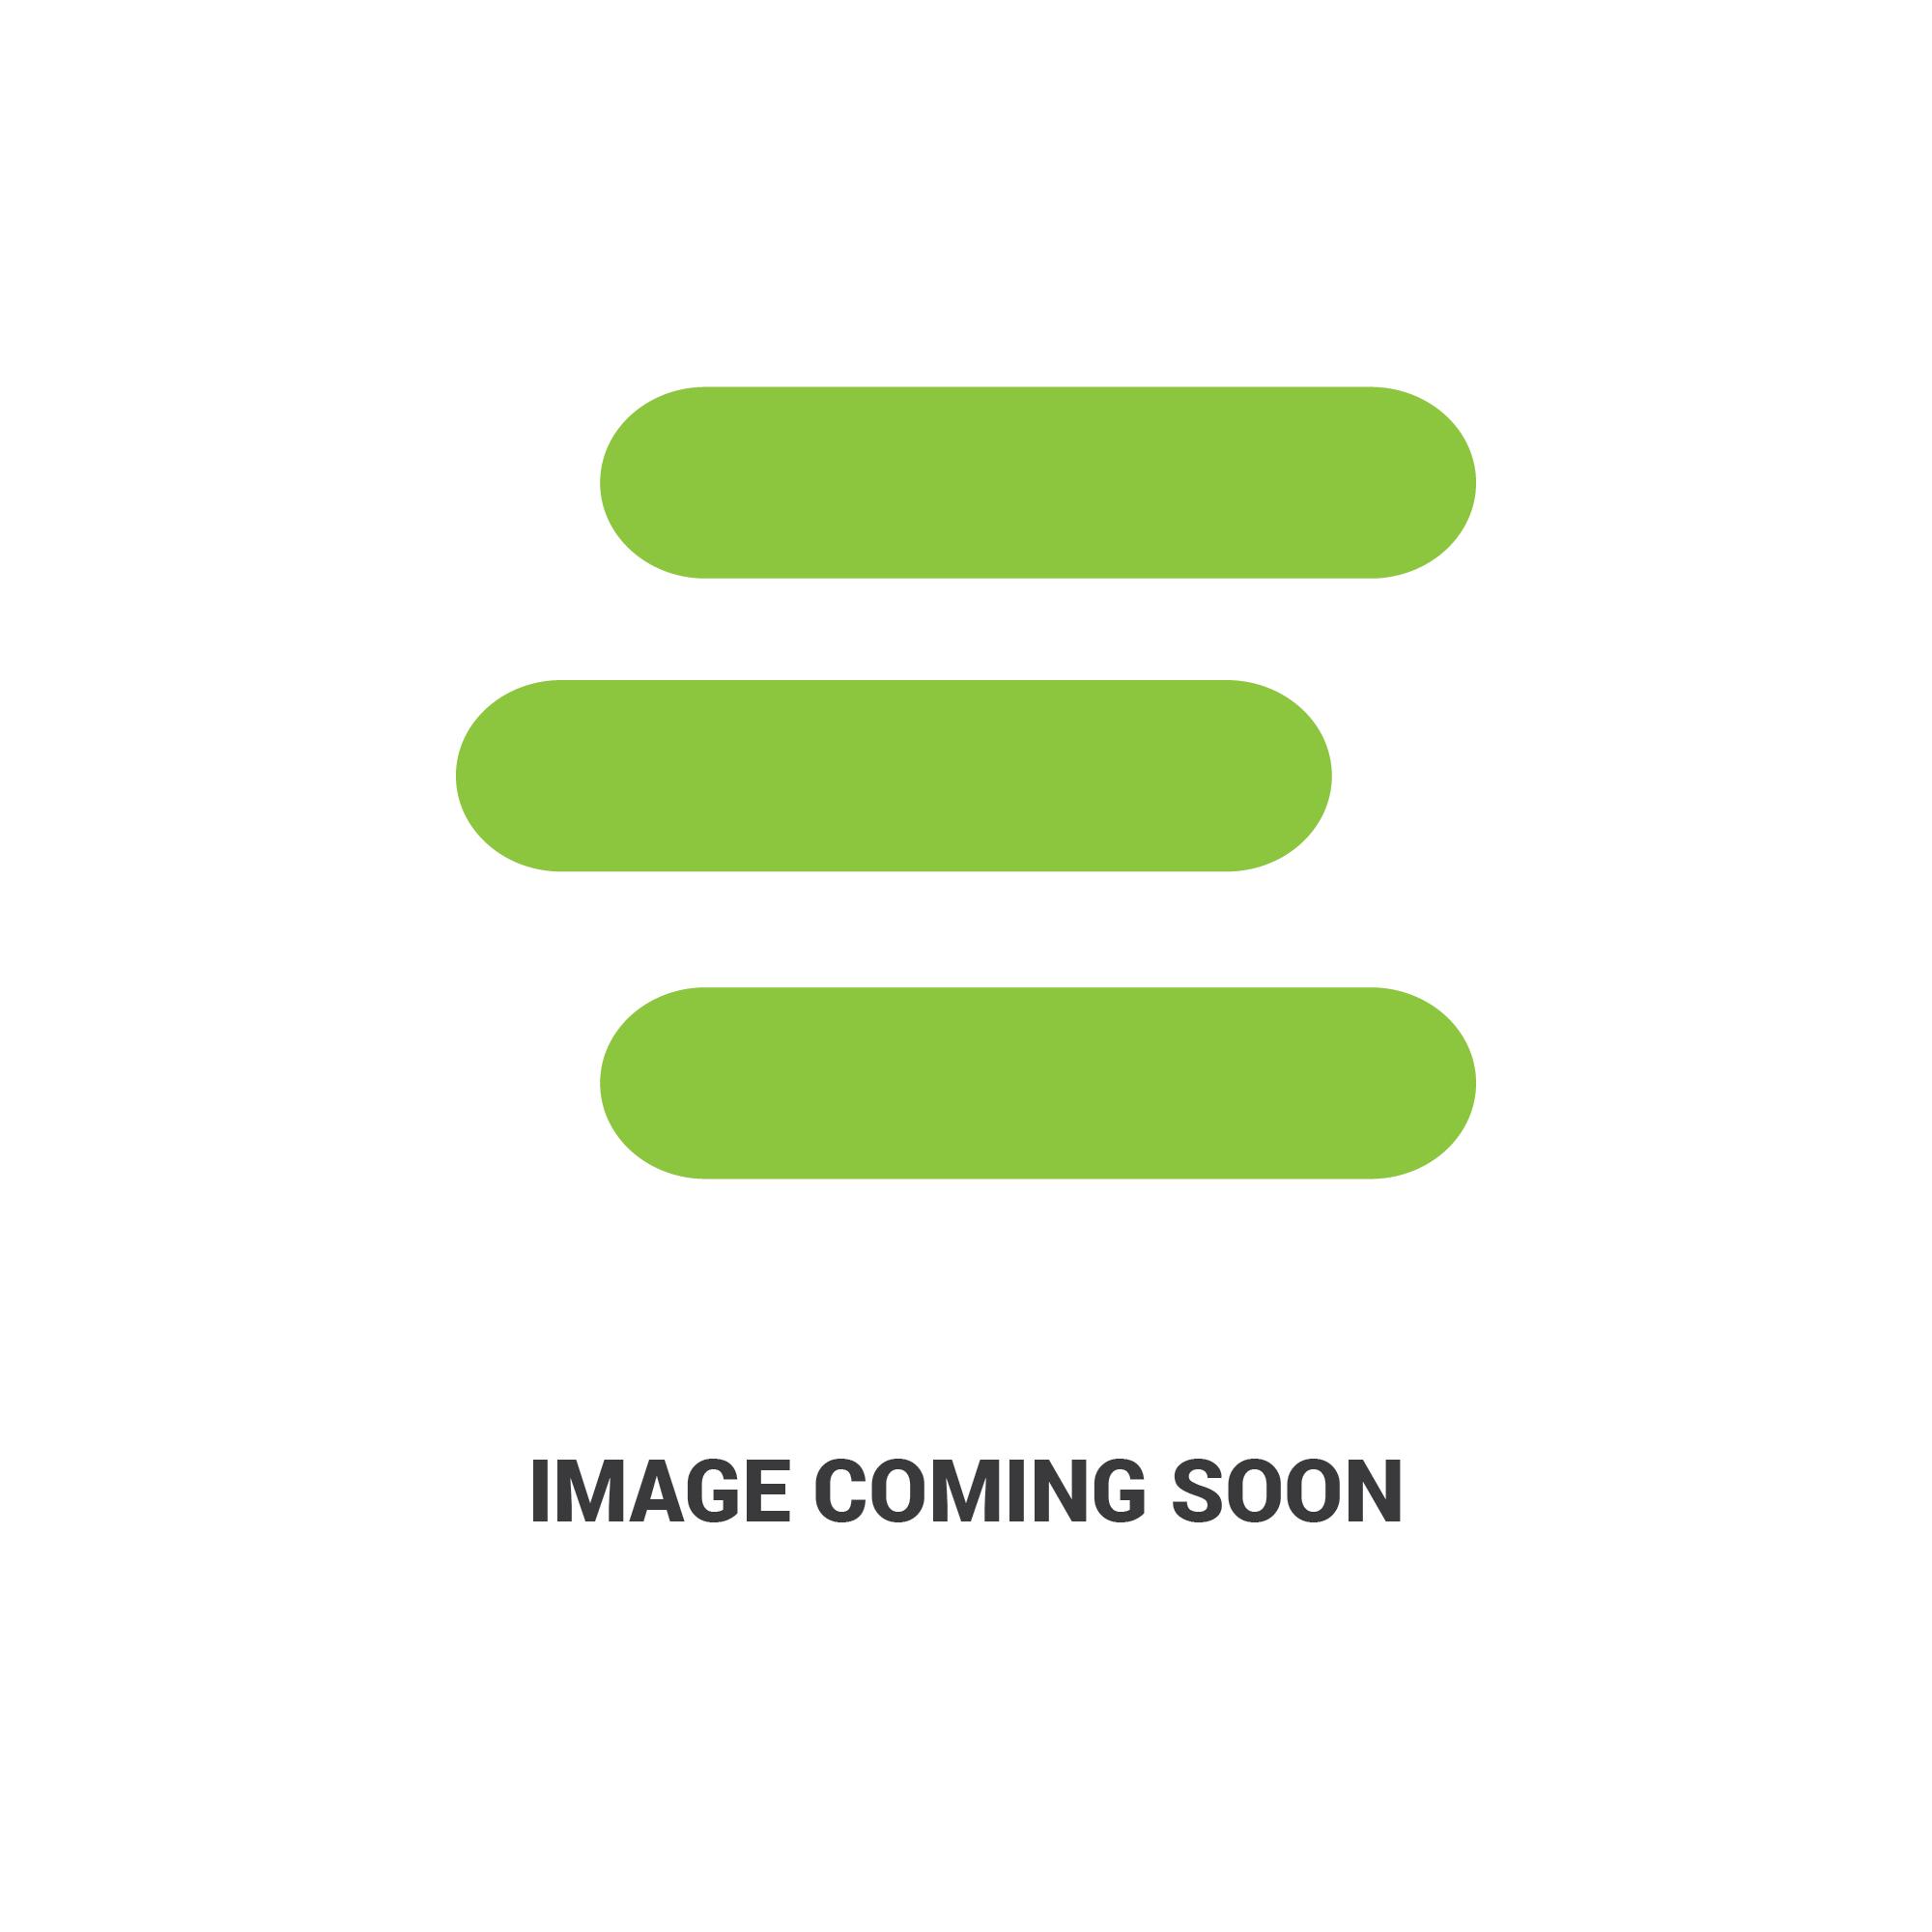 E-15575-12430edit 1.jpg